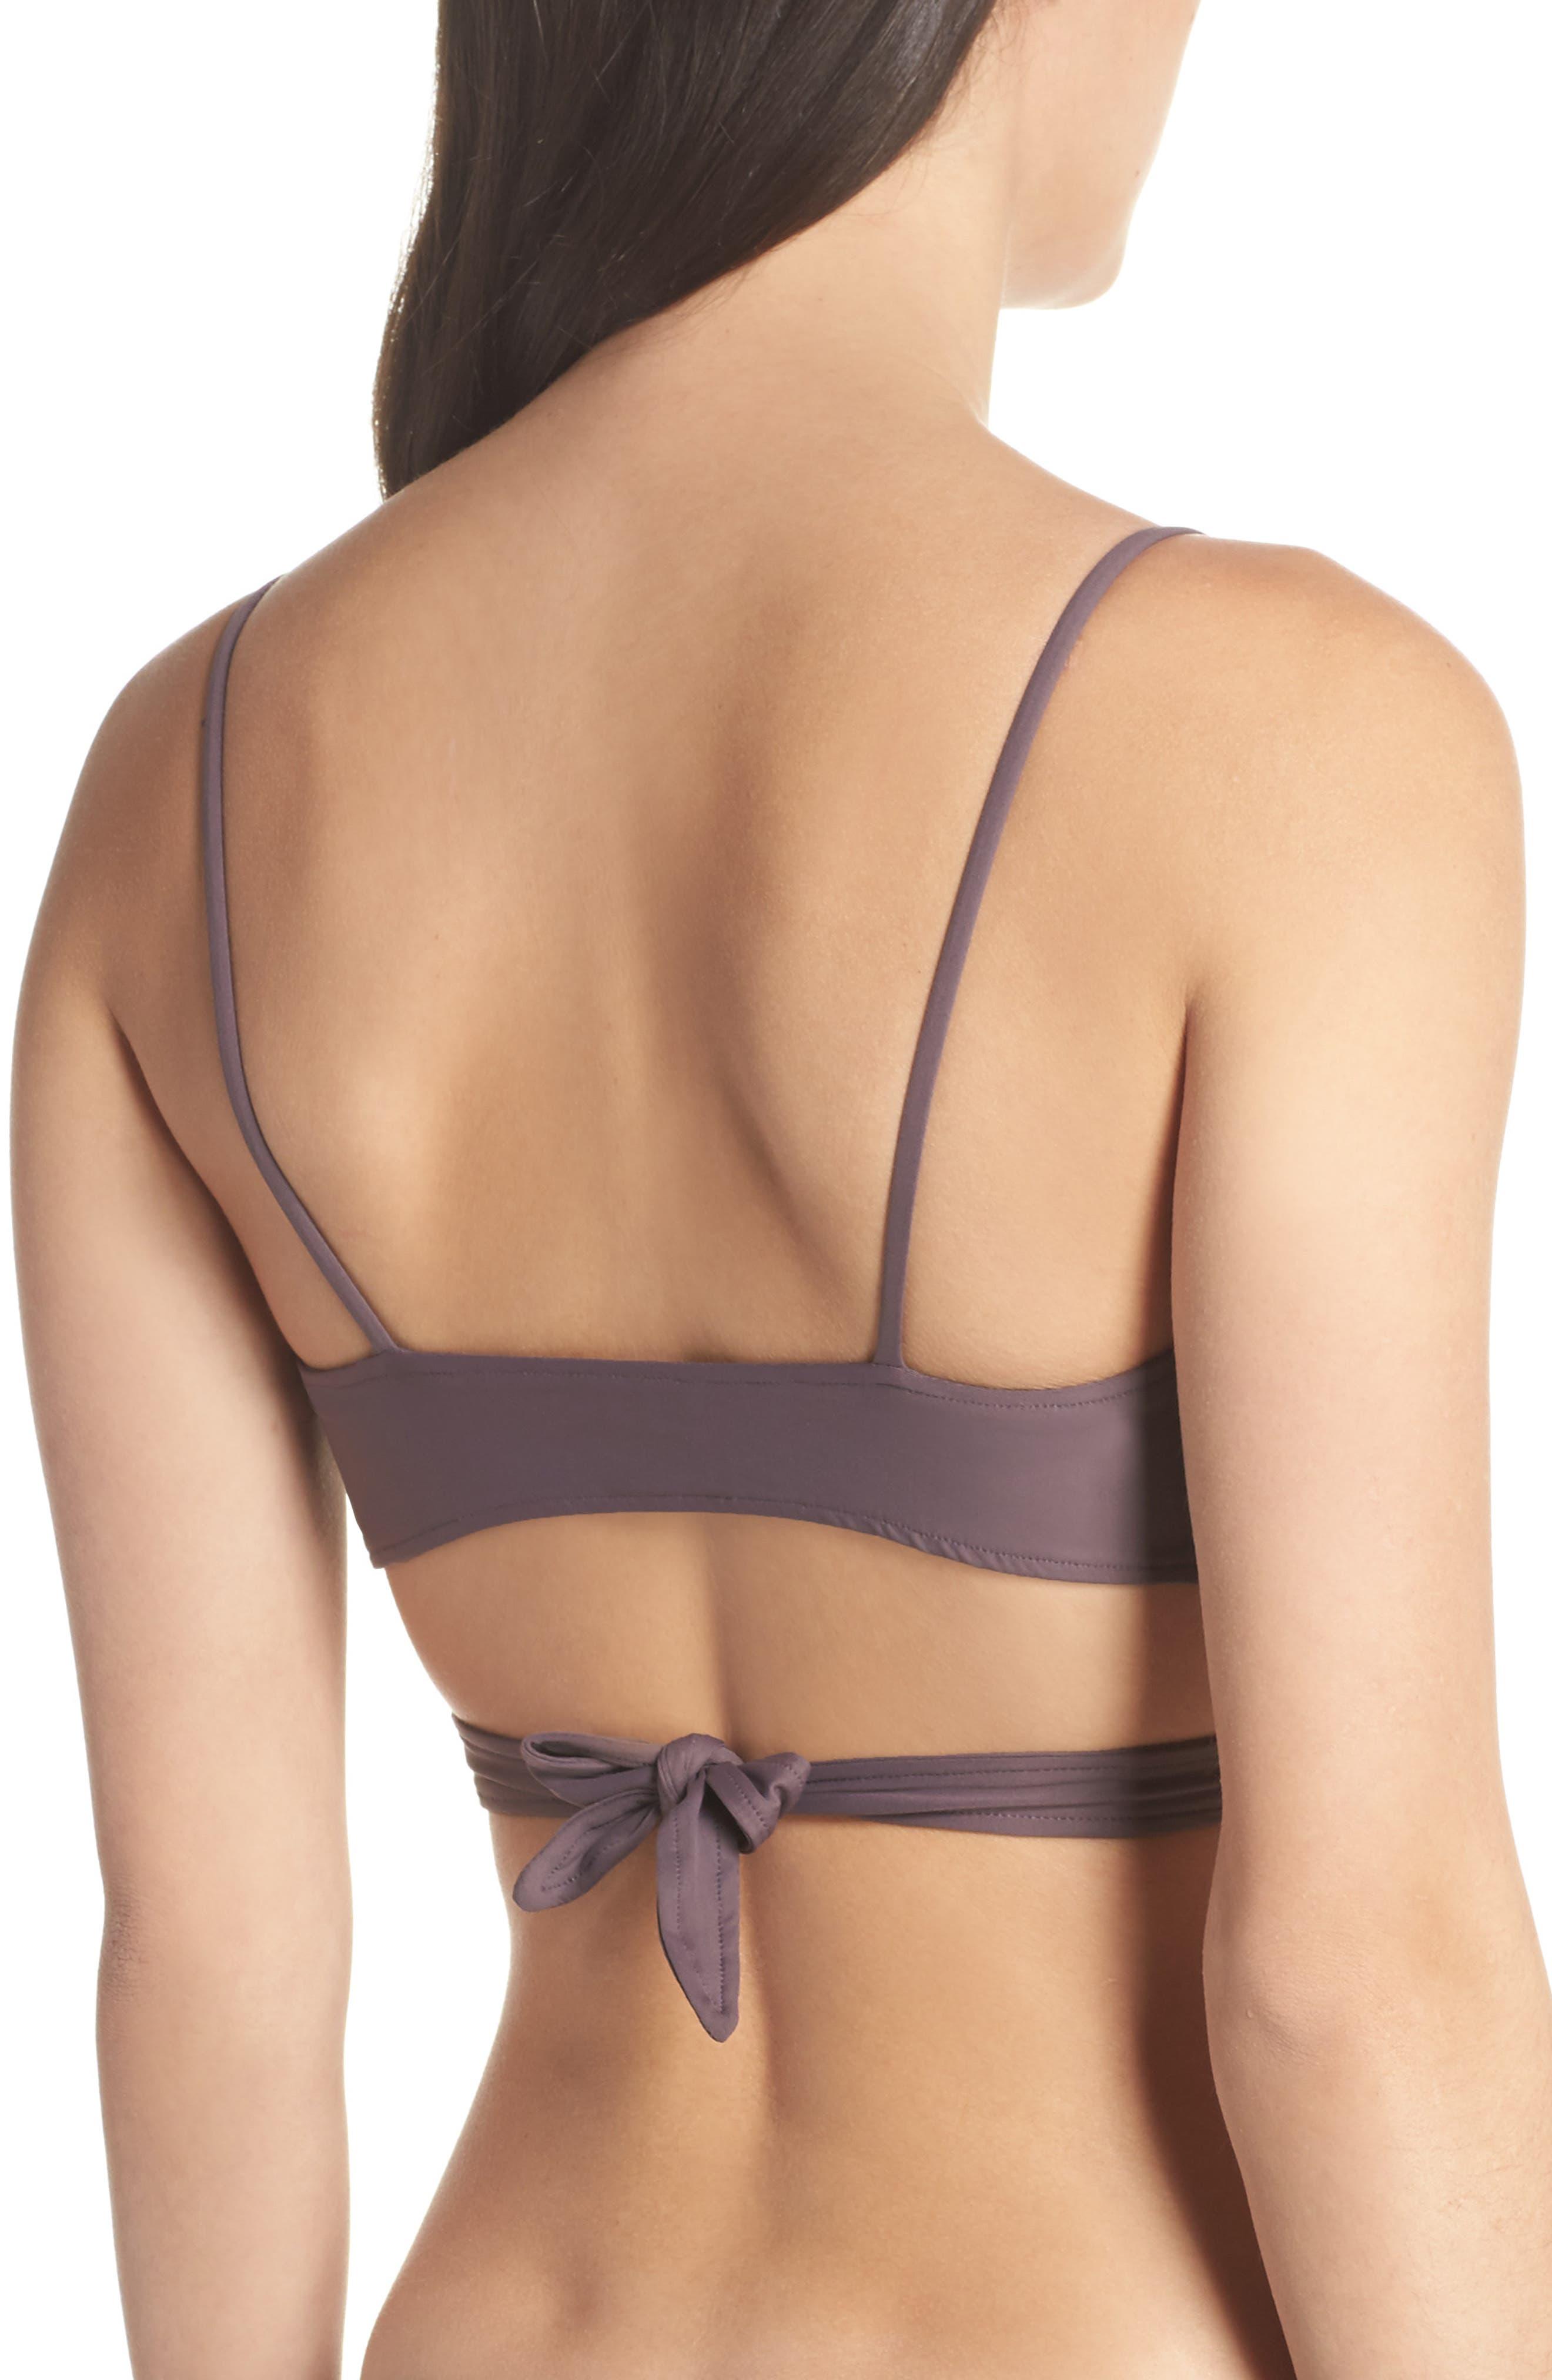 Chloe Wrap Bikini Top,                             Alternate thumbnail 2, color,                             020